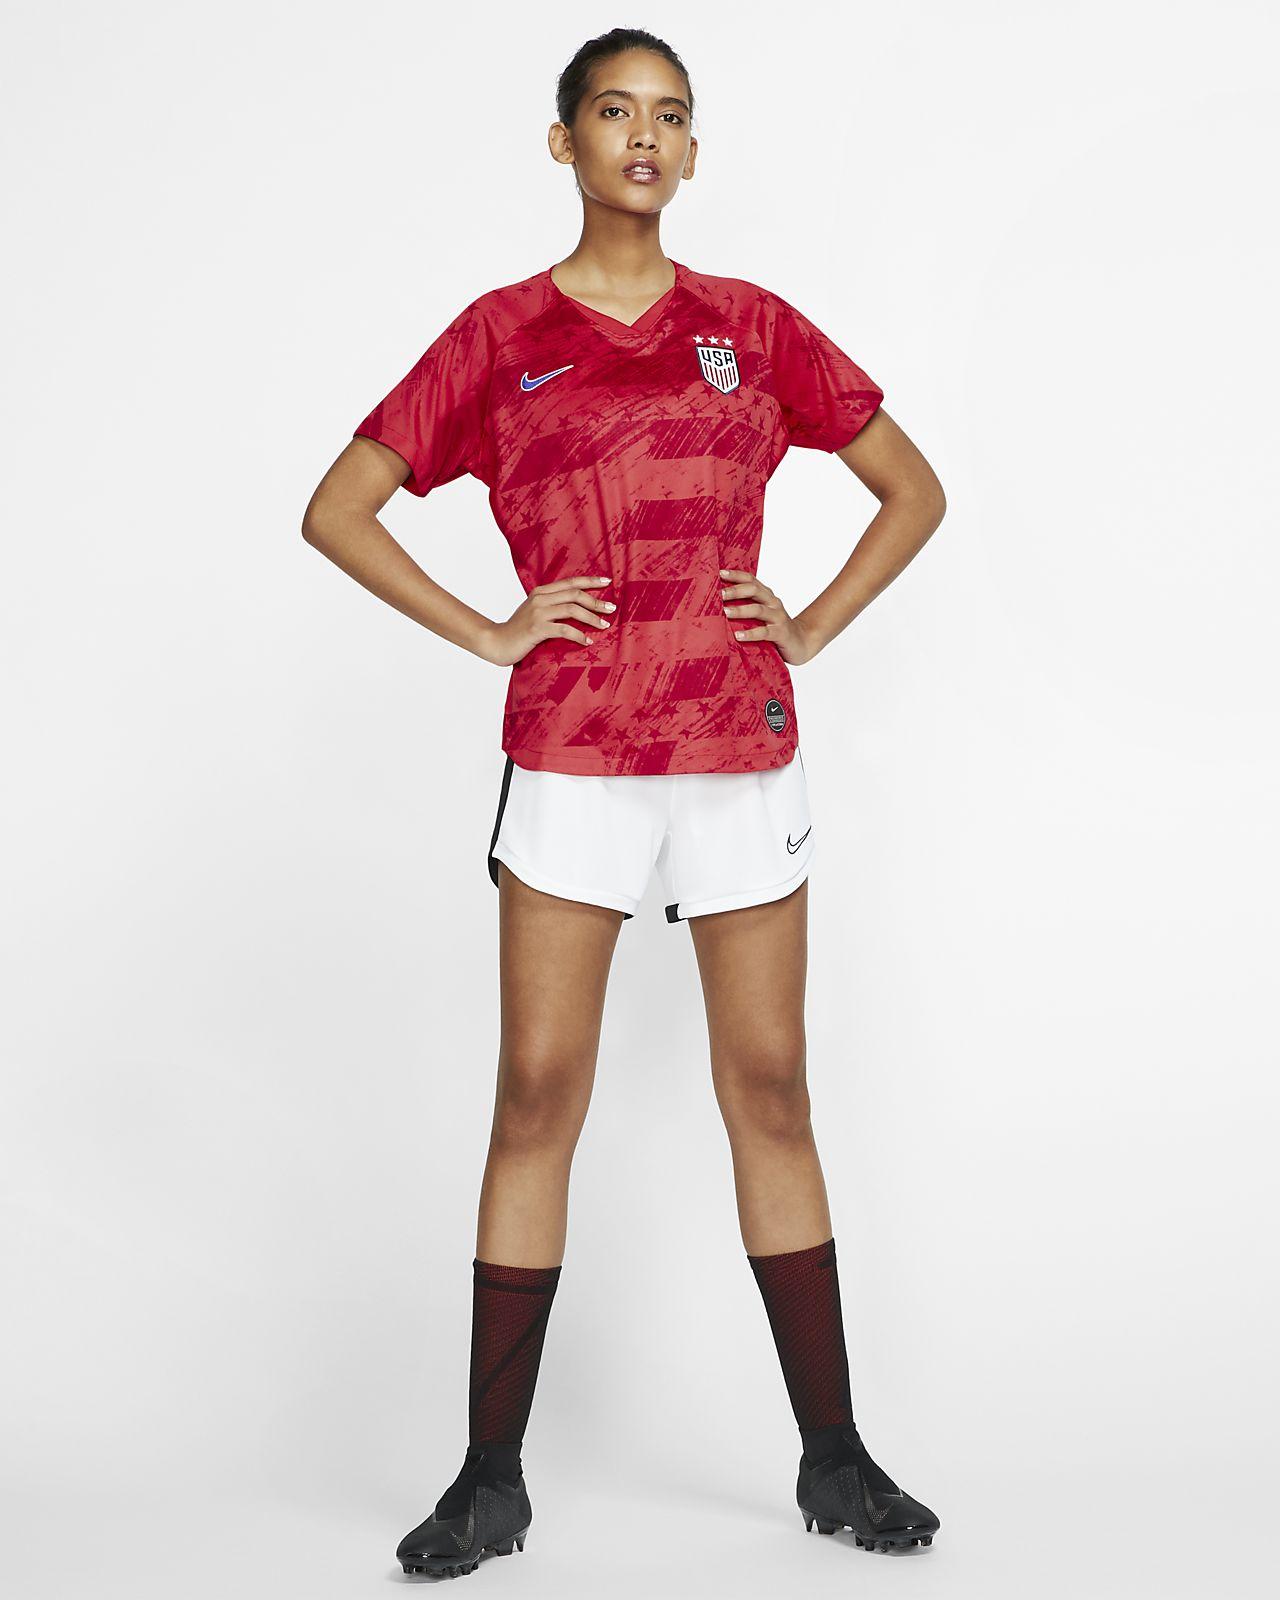 448dad05a U.S. 2019 Stadium Away Women s Soccer Jersey. Nike.com